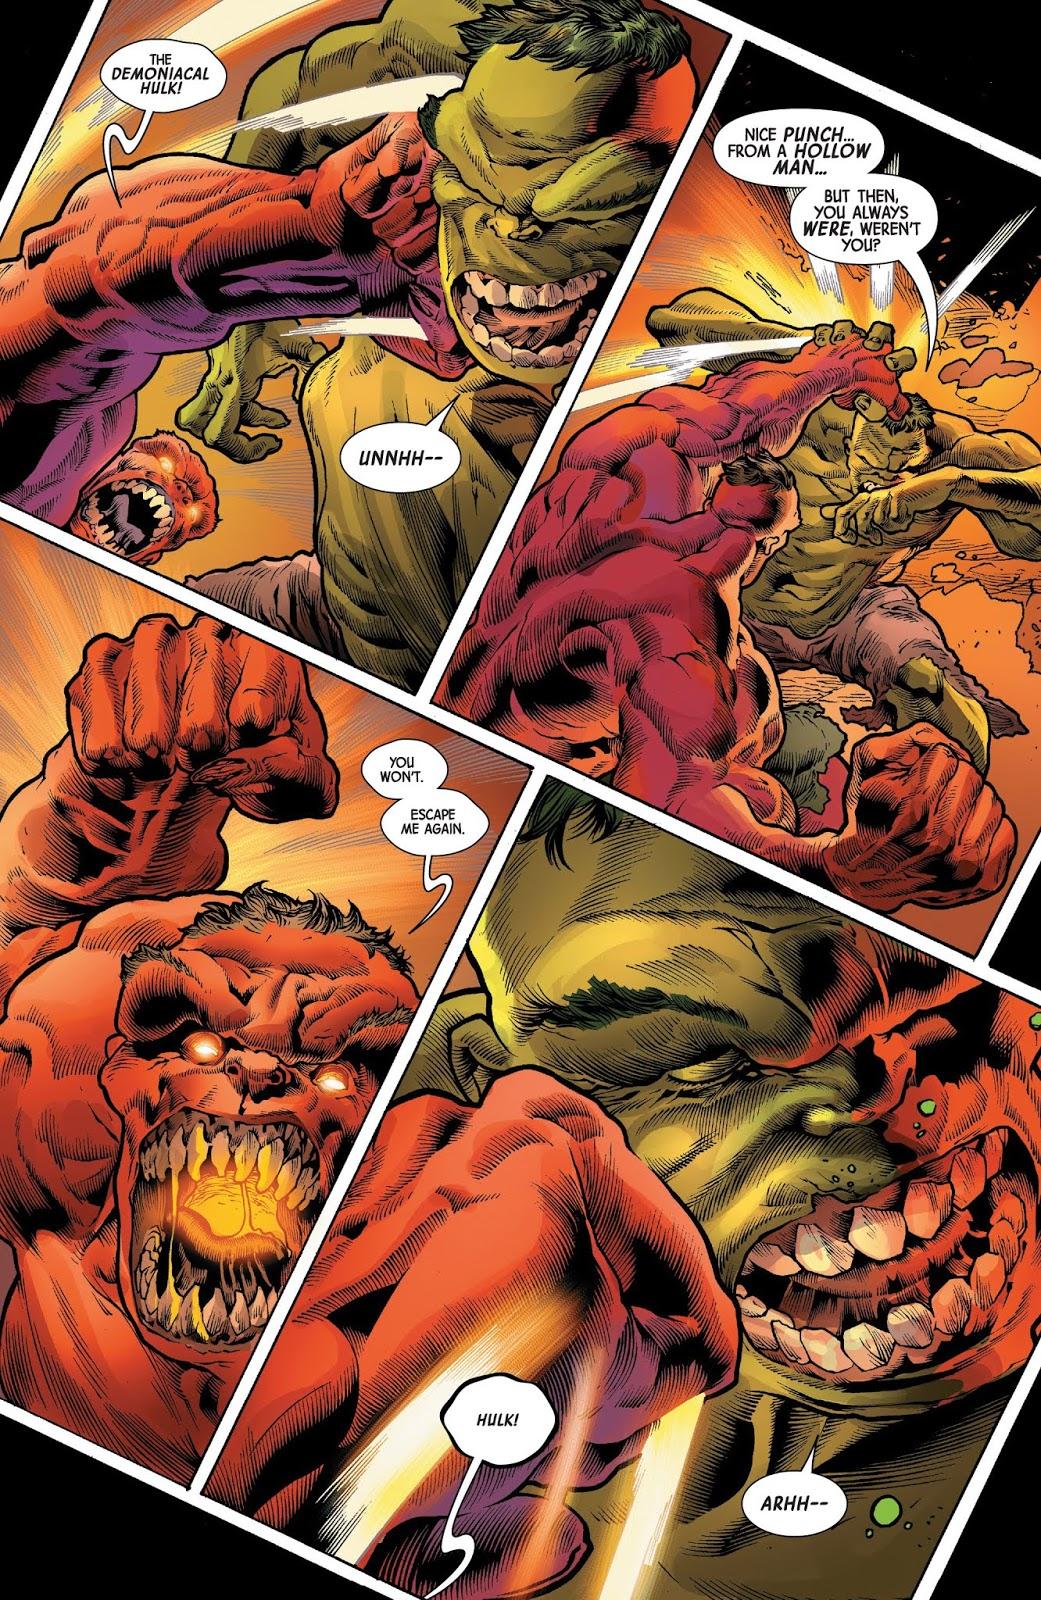 The Immortal Hulk VS The Red Hulk